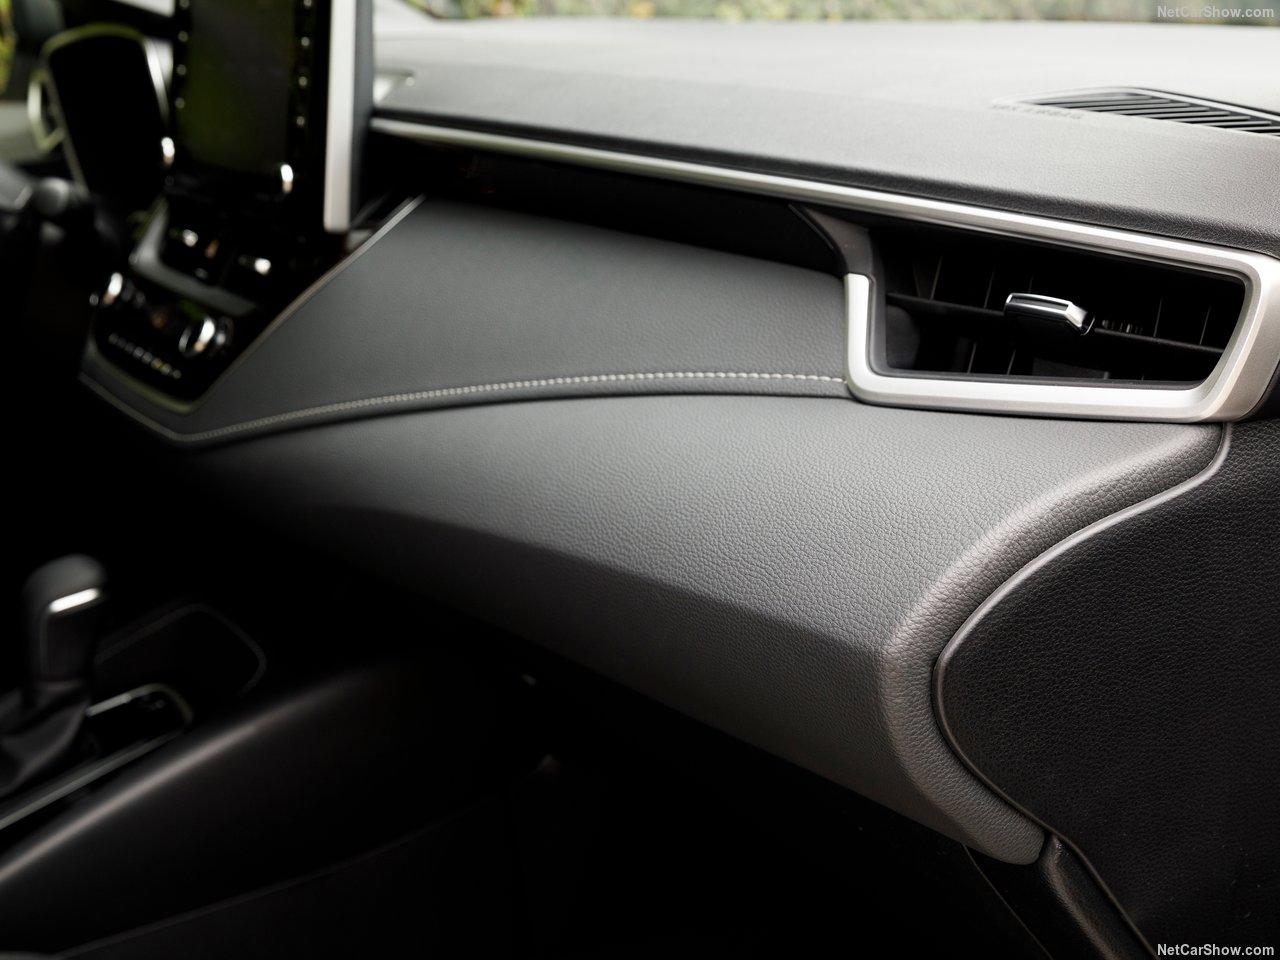 Toyota-Corolla_Hatchback-2019-1280-47.jpg